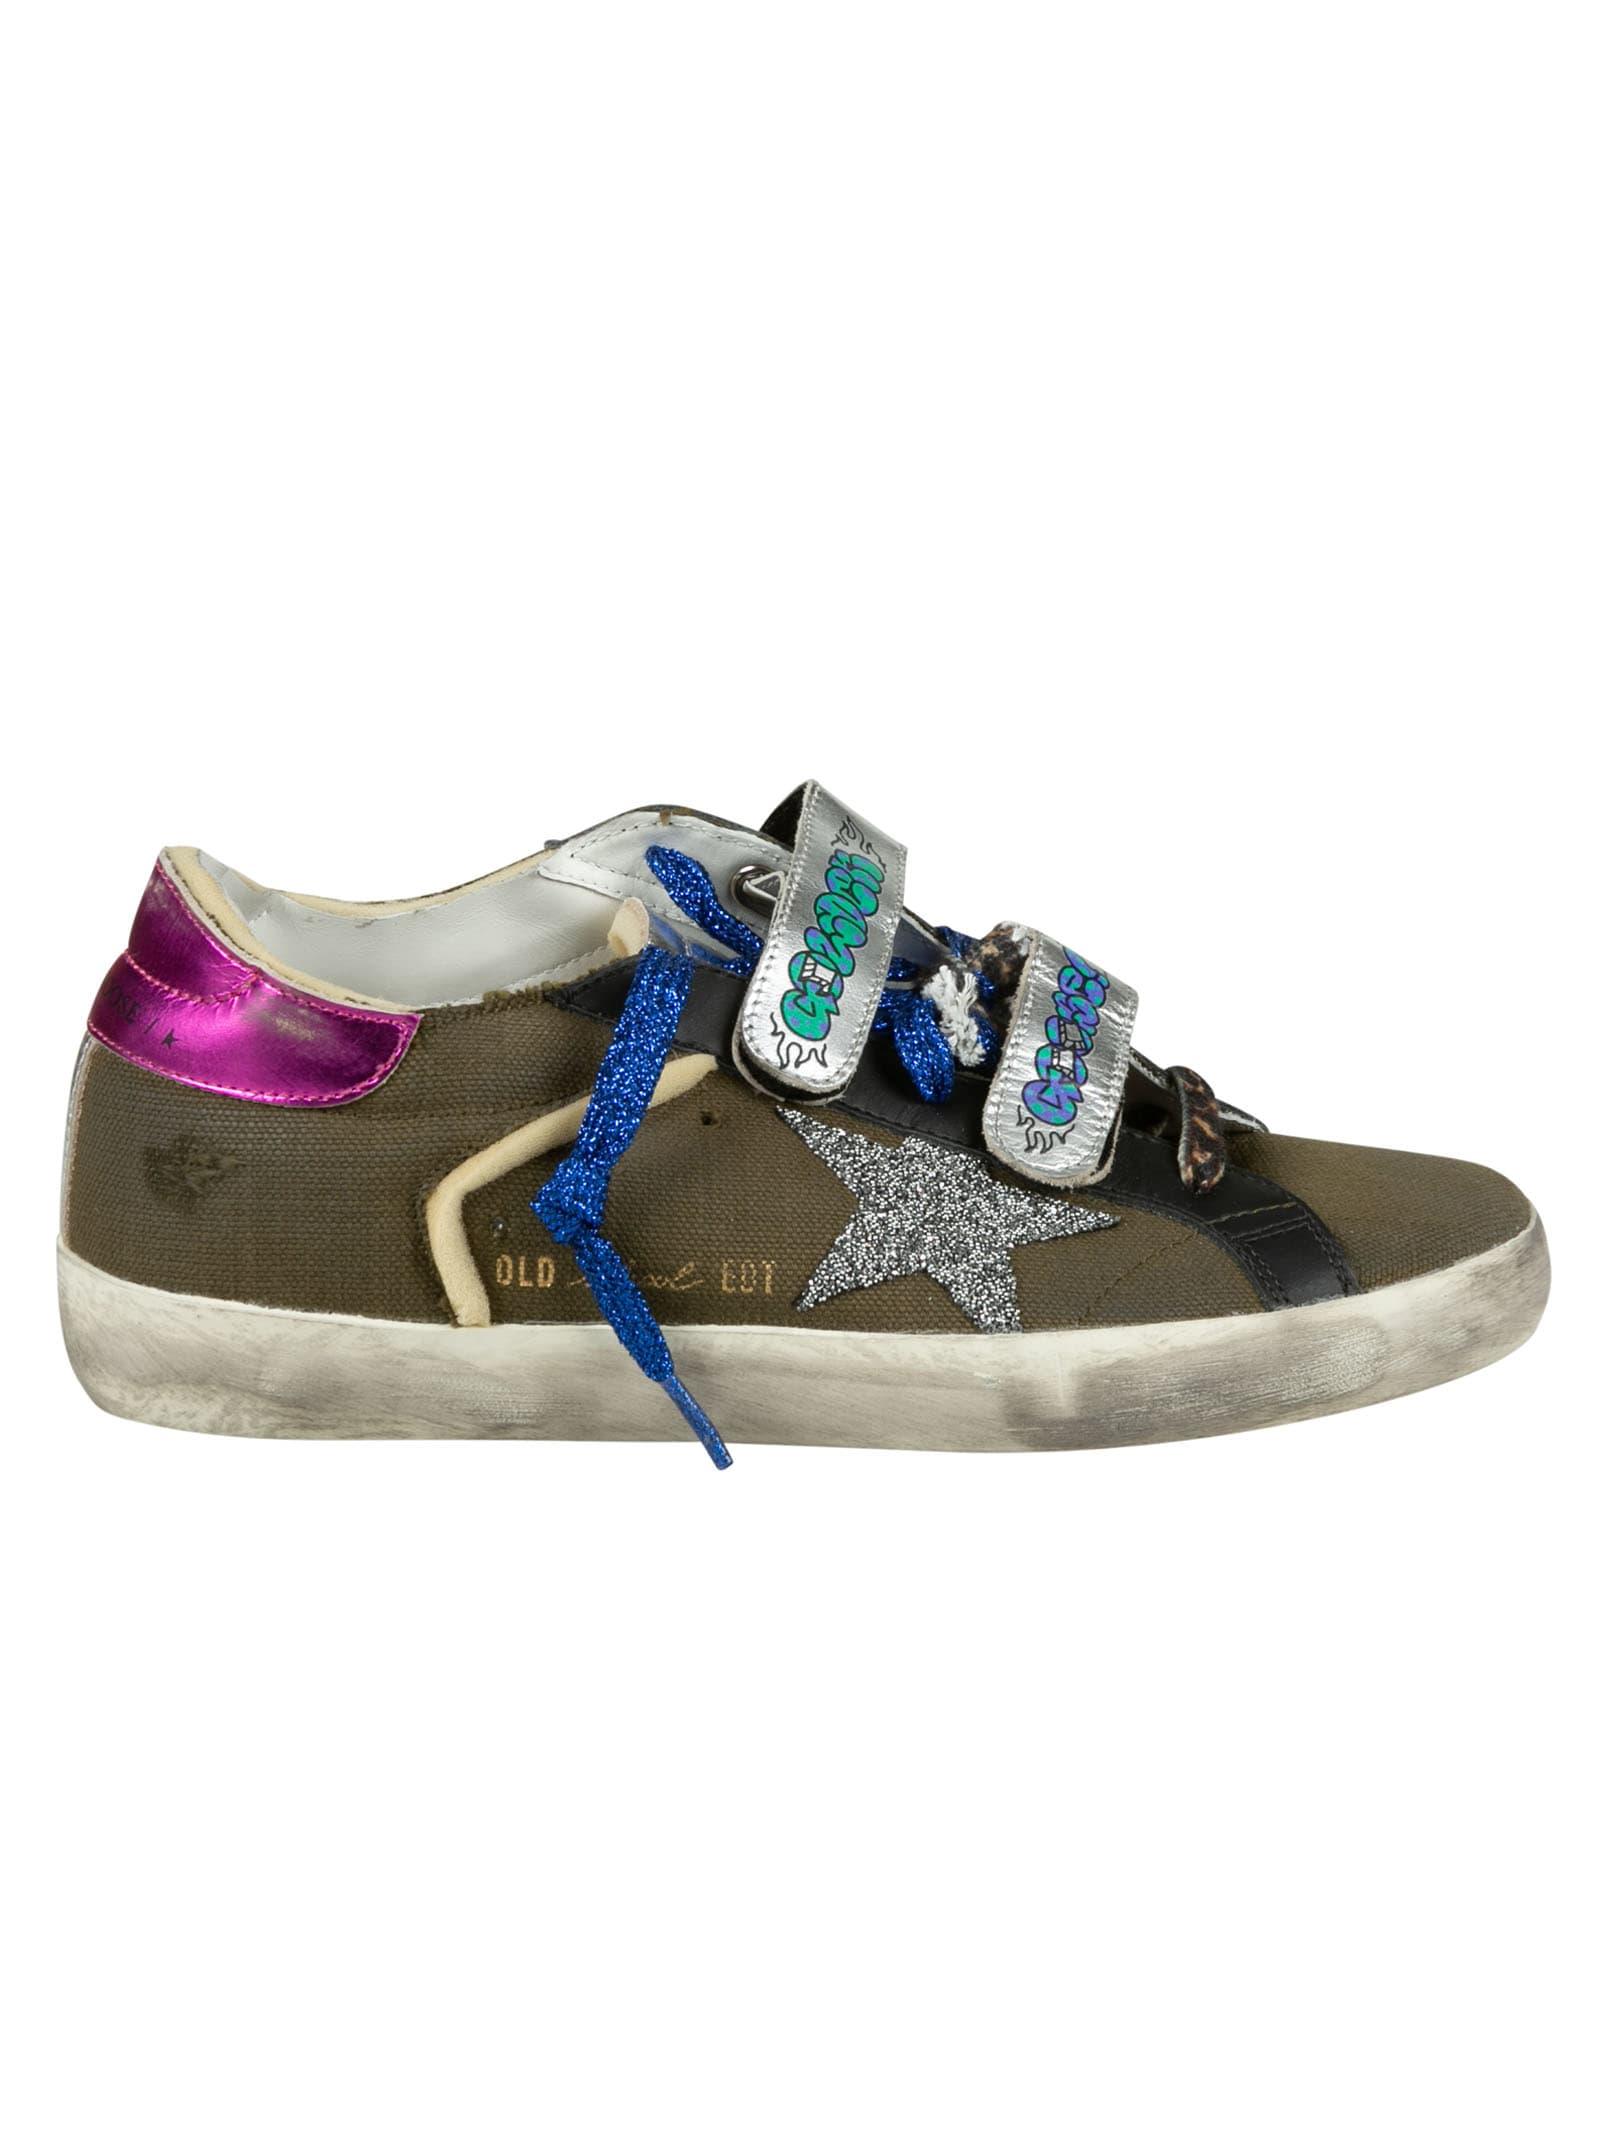 Golden Goose Canvas Upper Crystal Star Sneakers